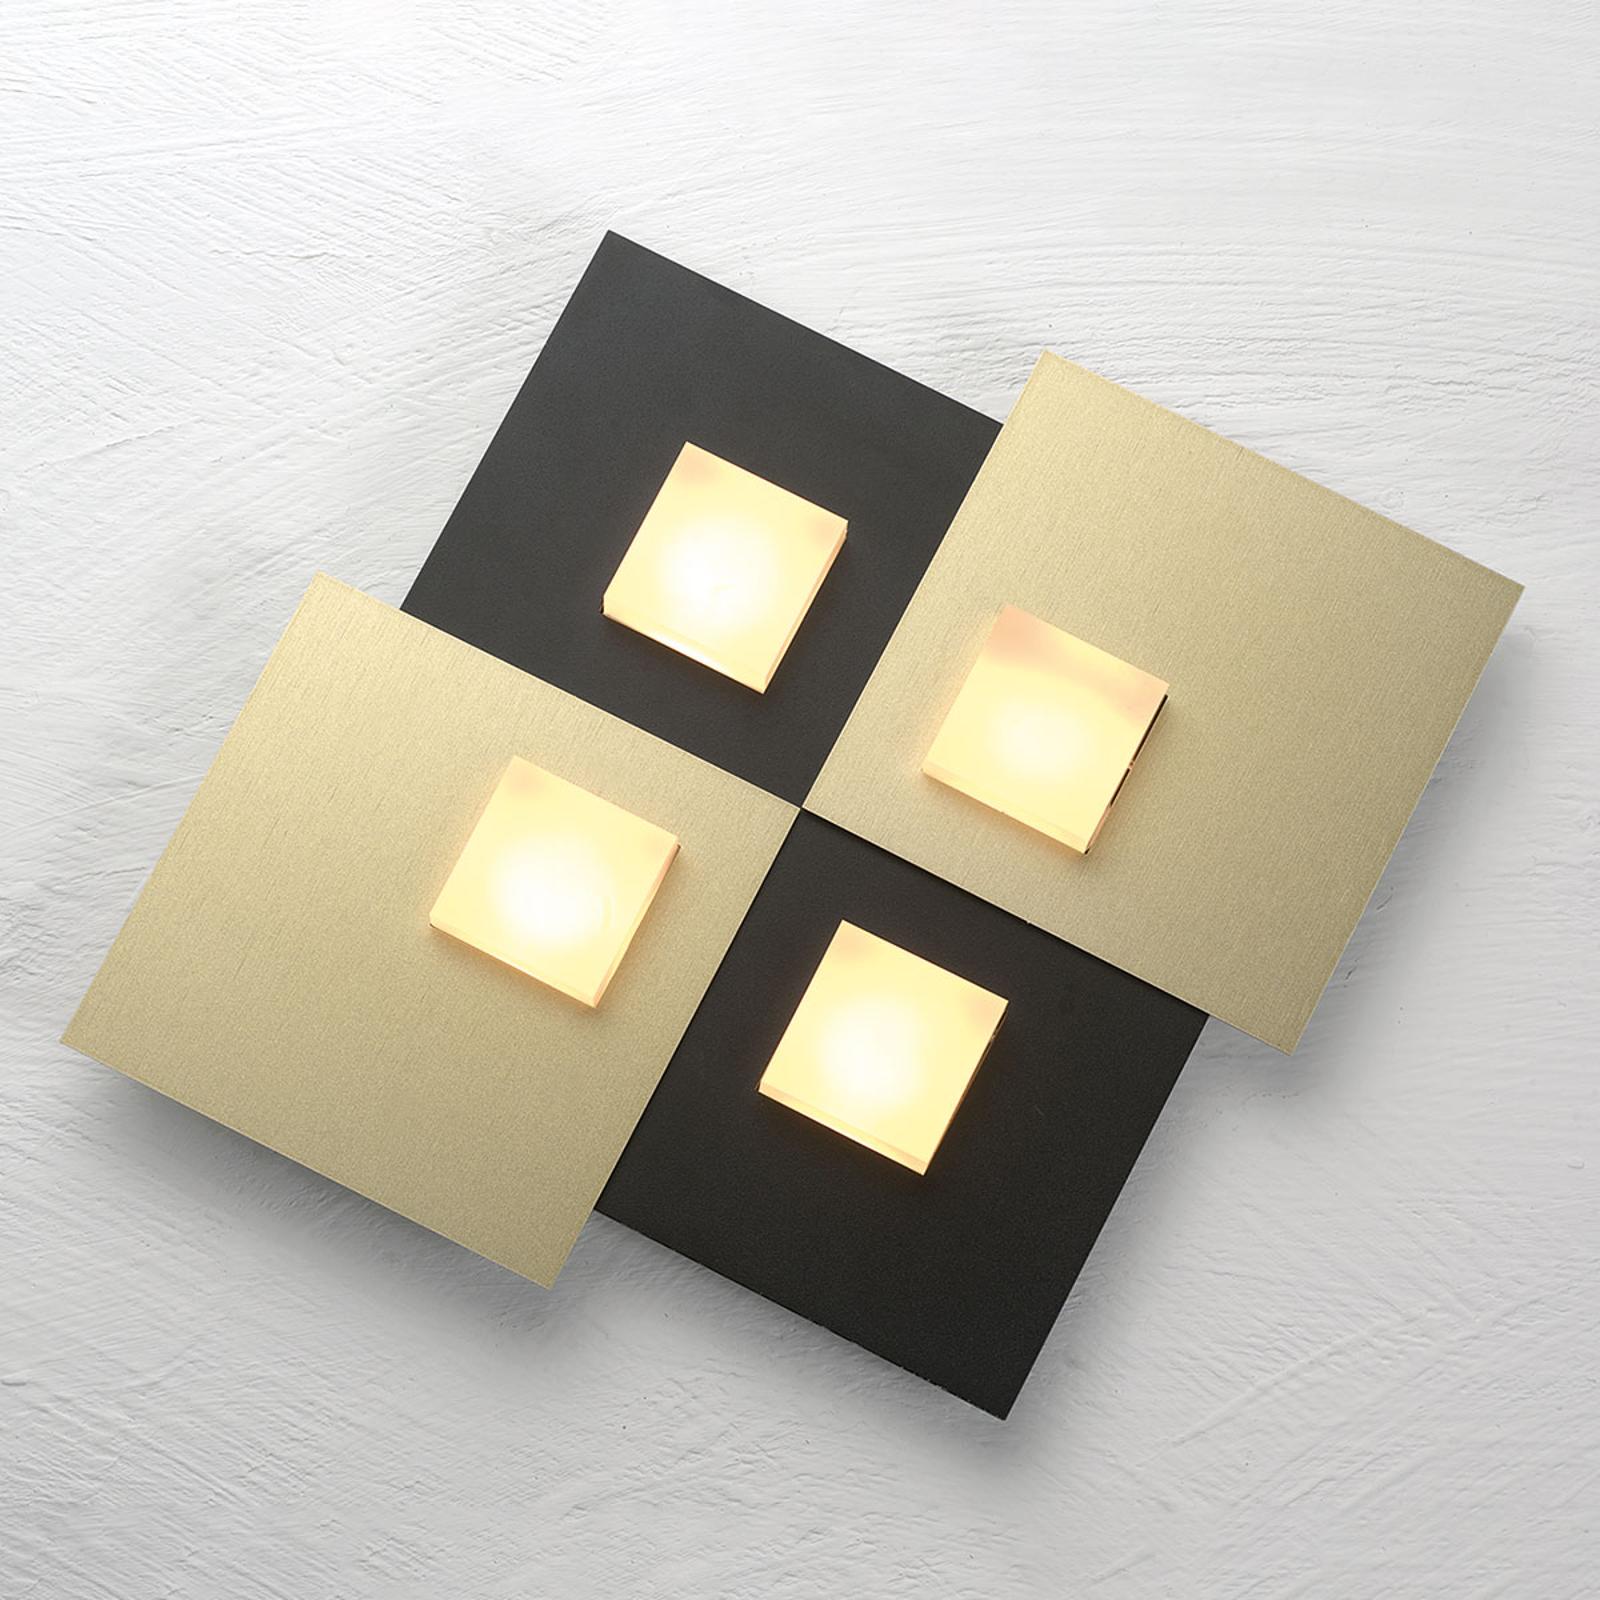 Bopp Pixel 2.0 plafonnier LED 4 lampe noir